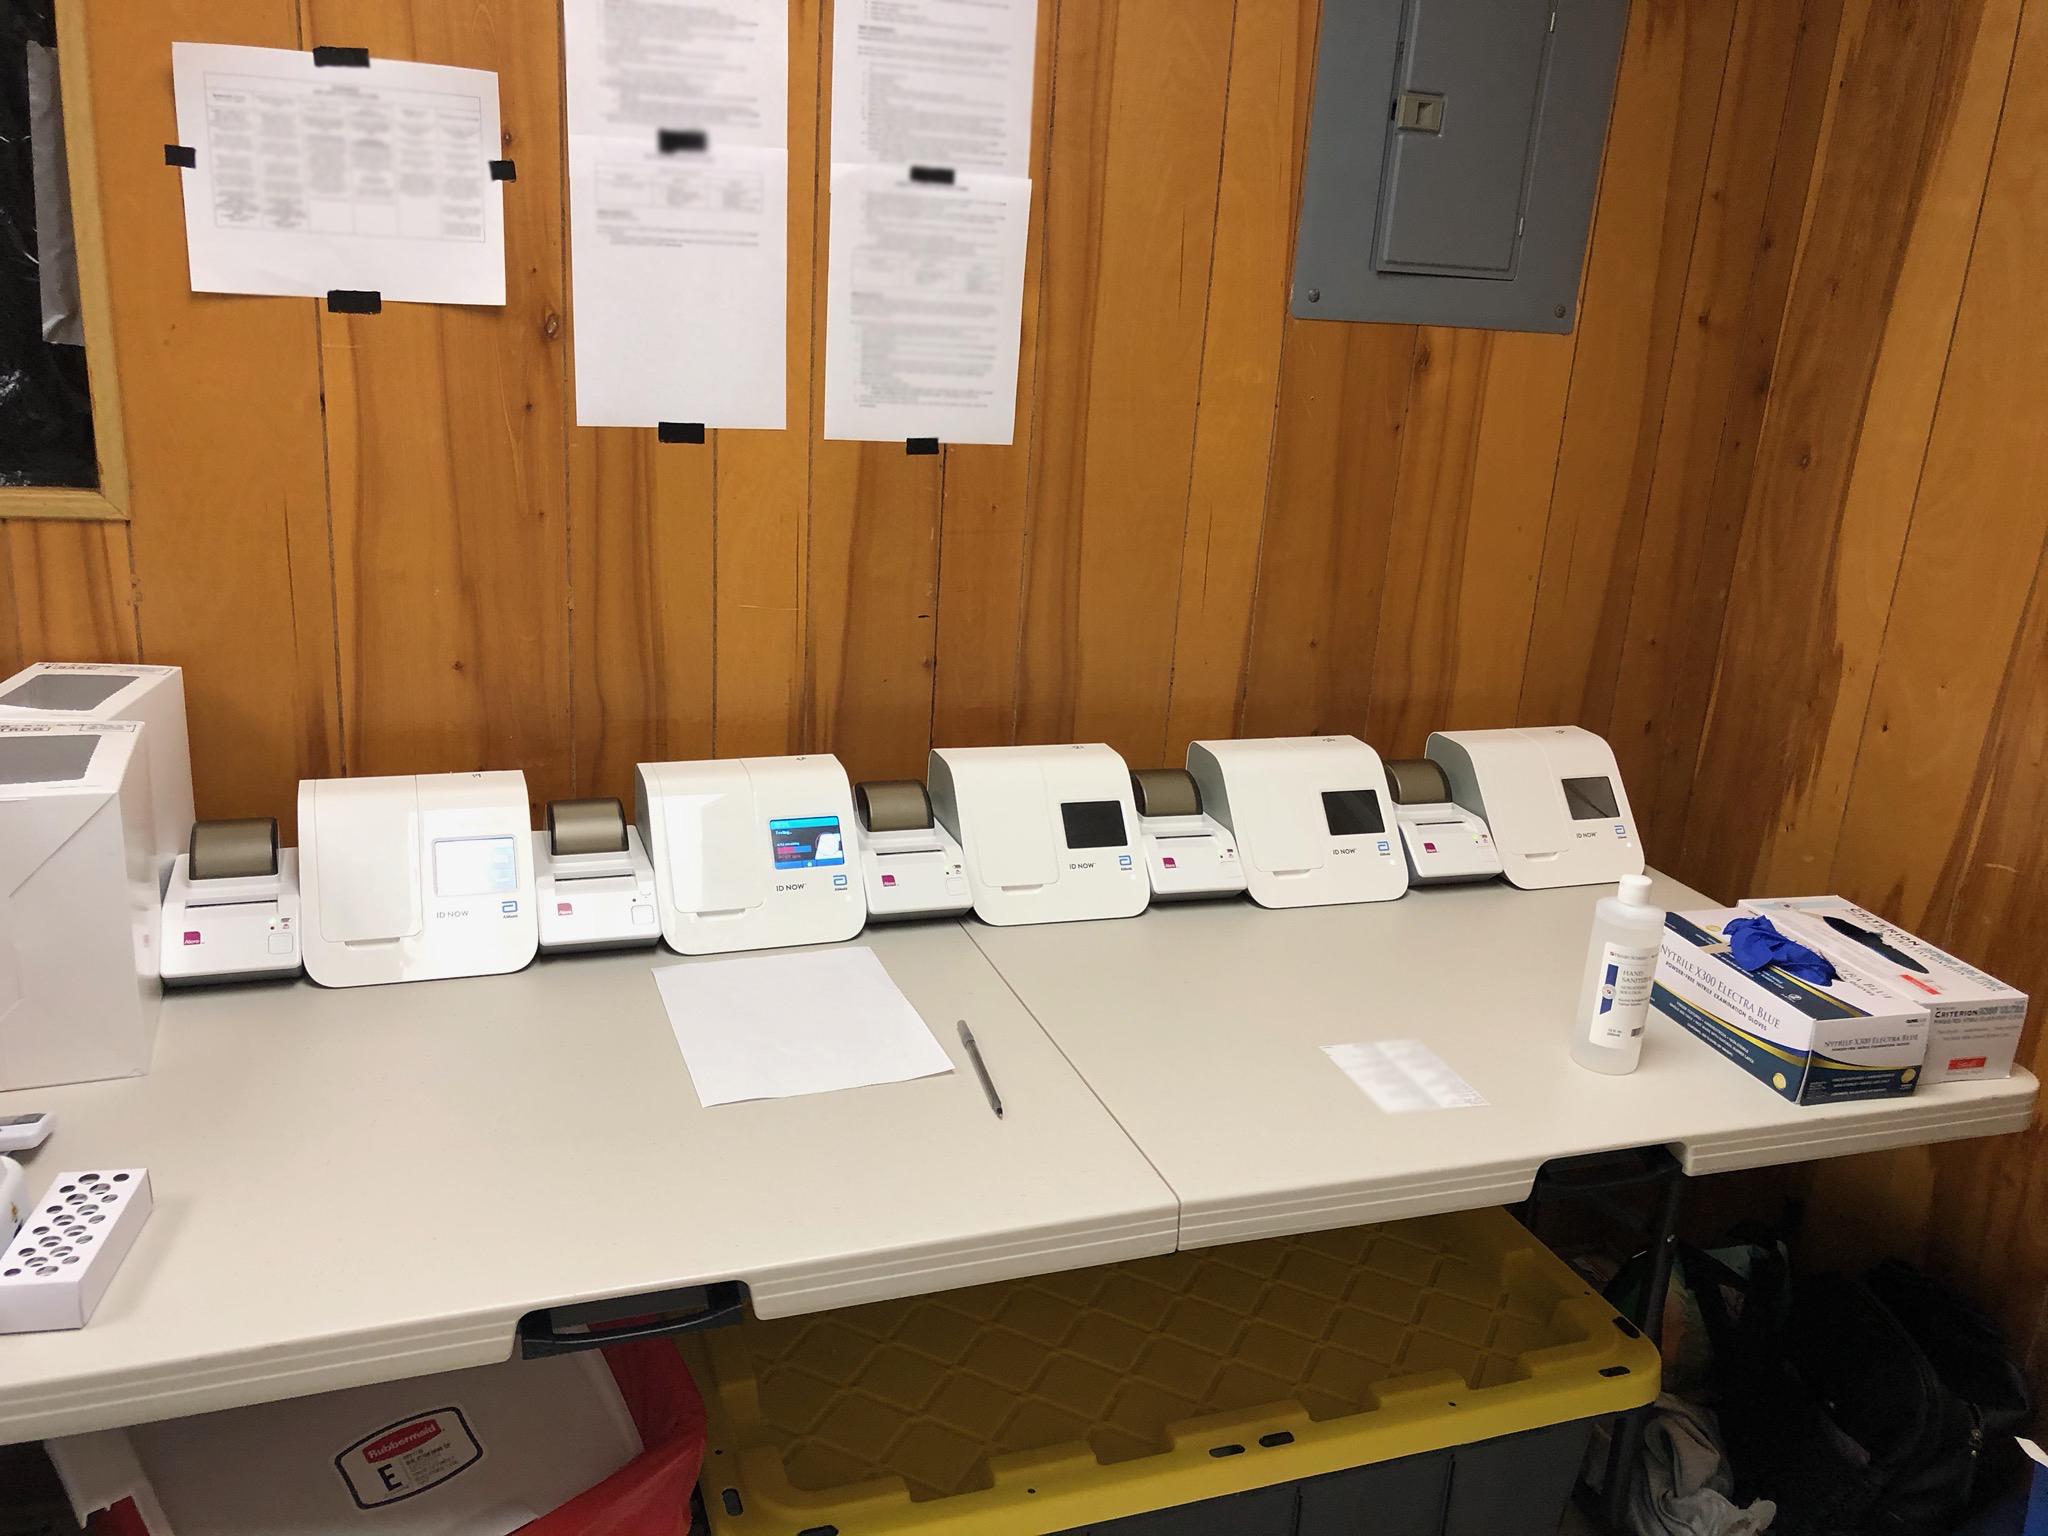 Oct. 20, 2021 COVID-19 Update: 139 New Cases in Hawai'i